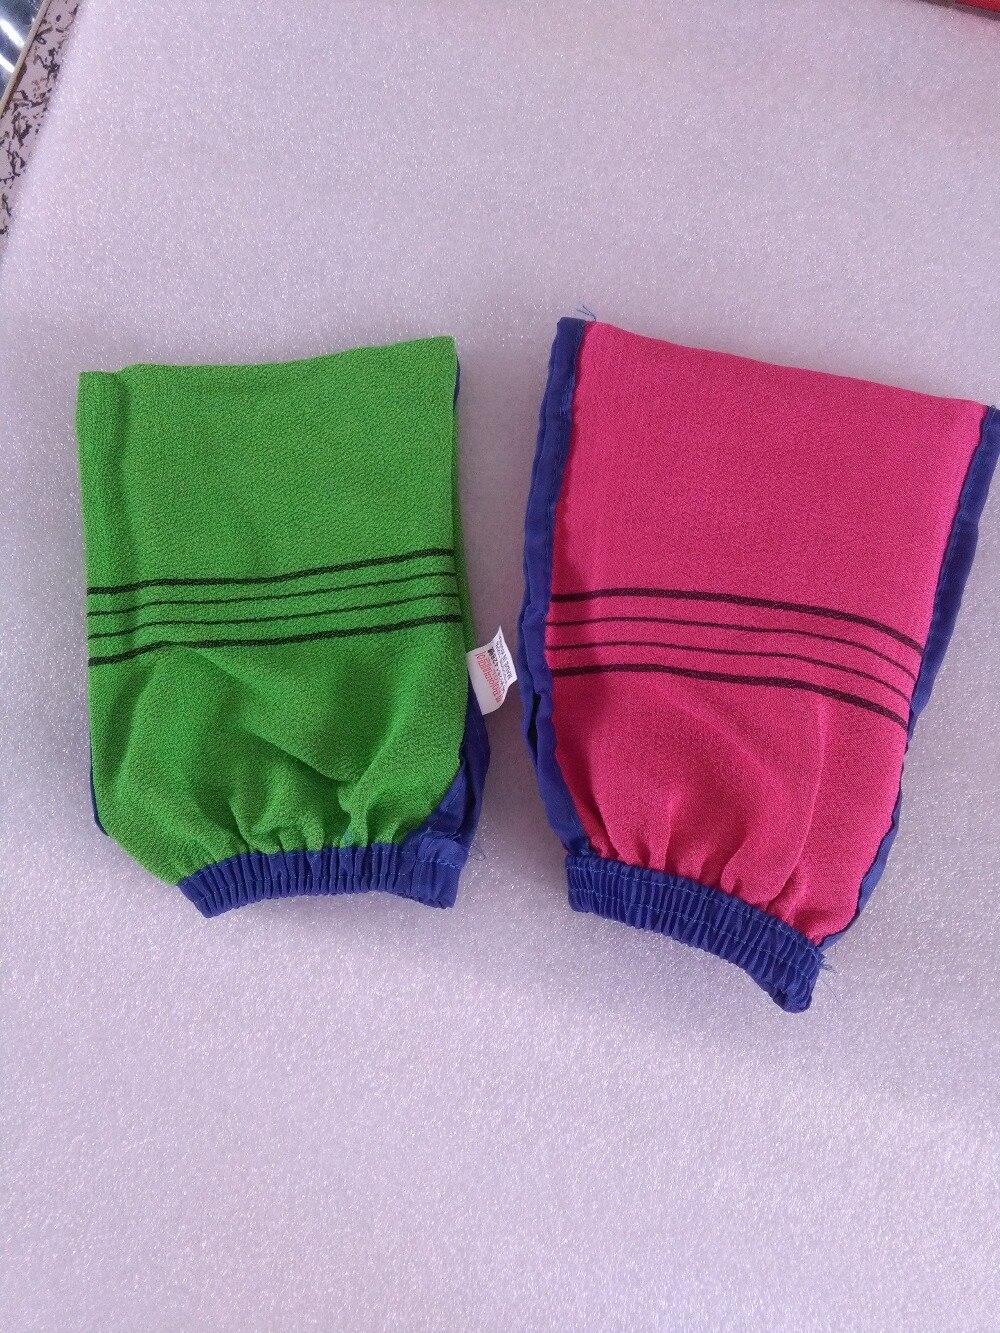 DHL 100pcs/lot High quality Double sided hammam scrub mitt magic peeling glove exfoliating tan removal mitt